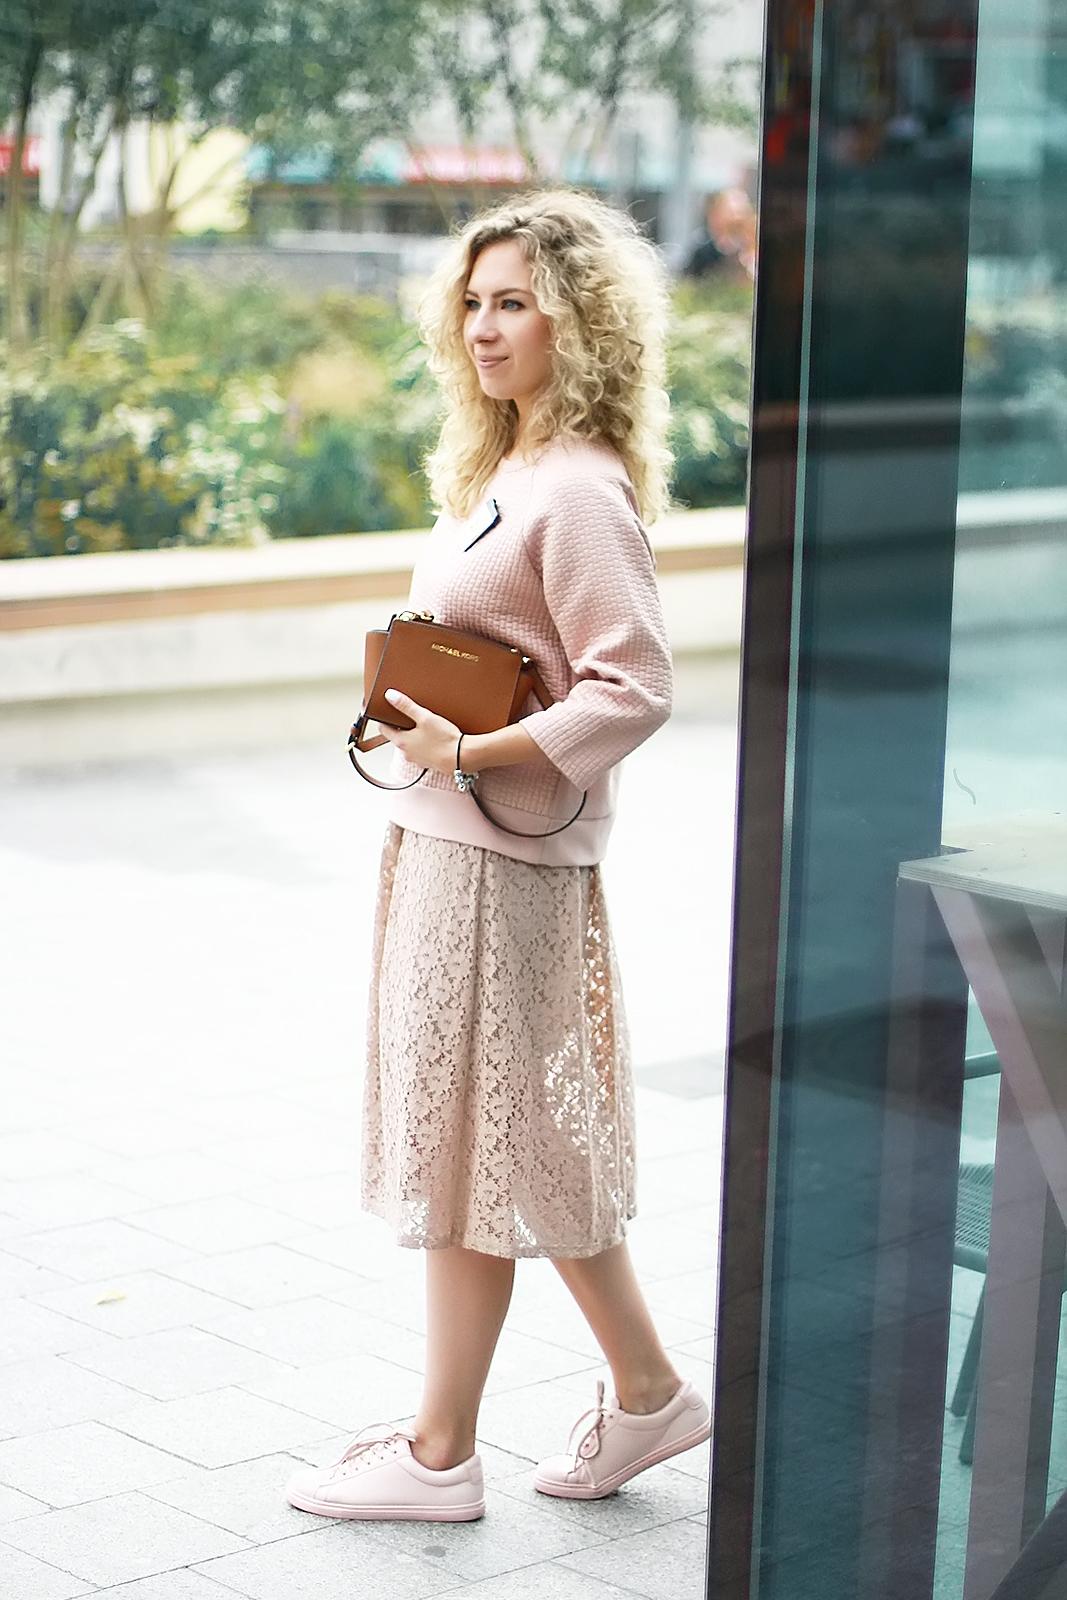 margarita_maslova_nude_look_sweatshit_midi_skirt_pink_sneakers